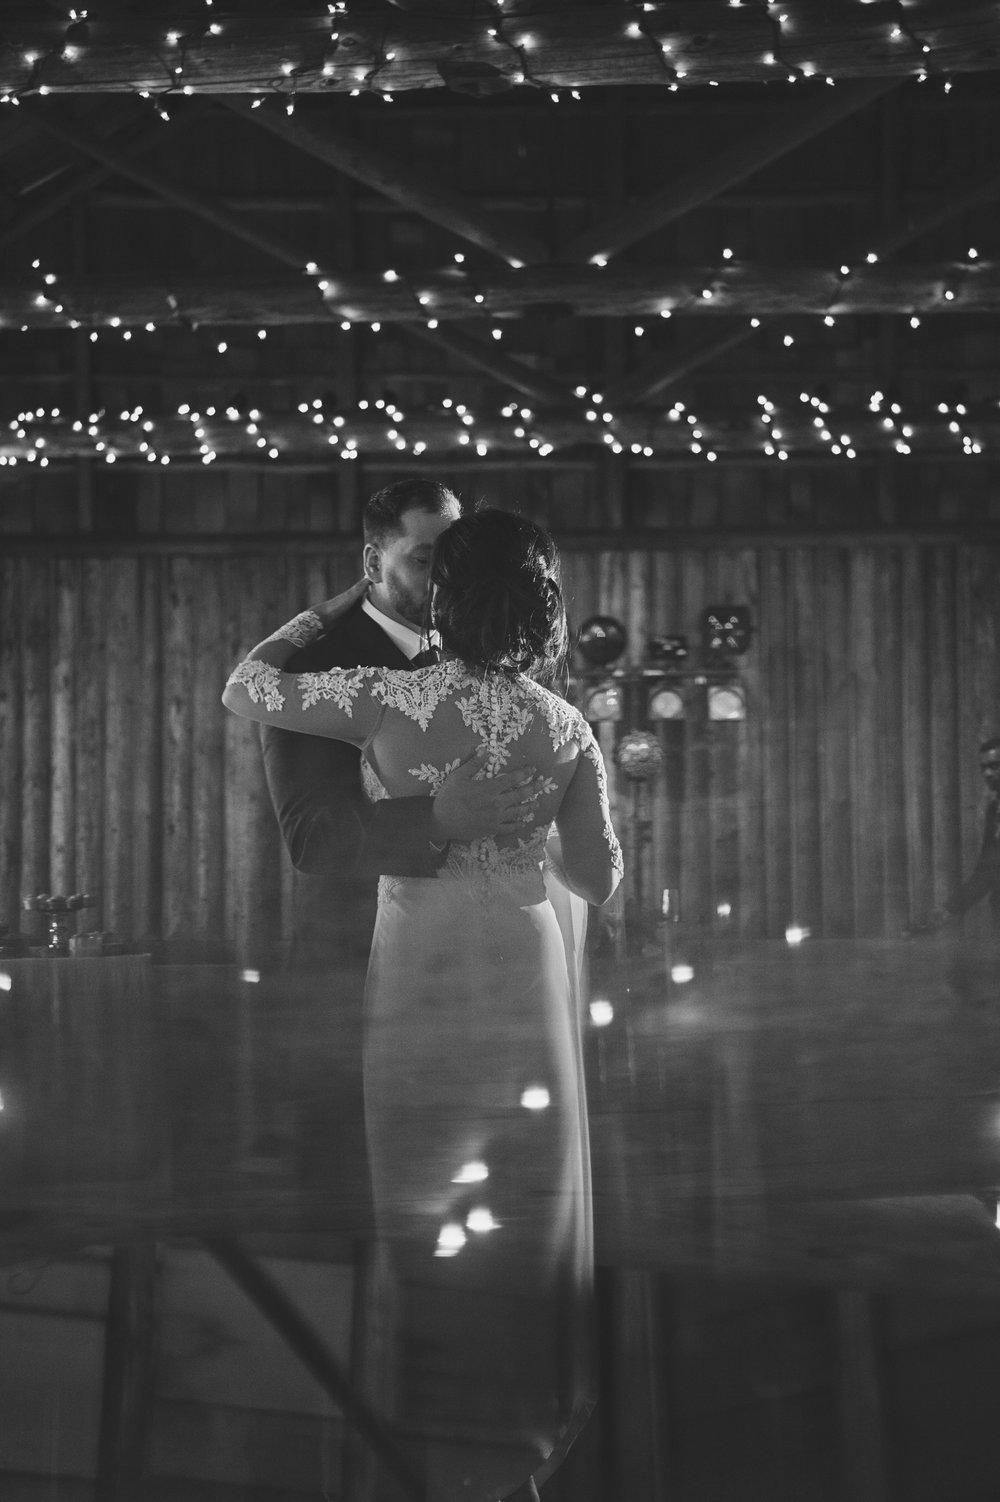 Kim La Plante + Nick Samet_Poulsbo Wedding_Kitsap Memorial Park Wedding_Kelsey Lane Photography-9899.jpg